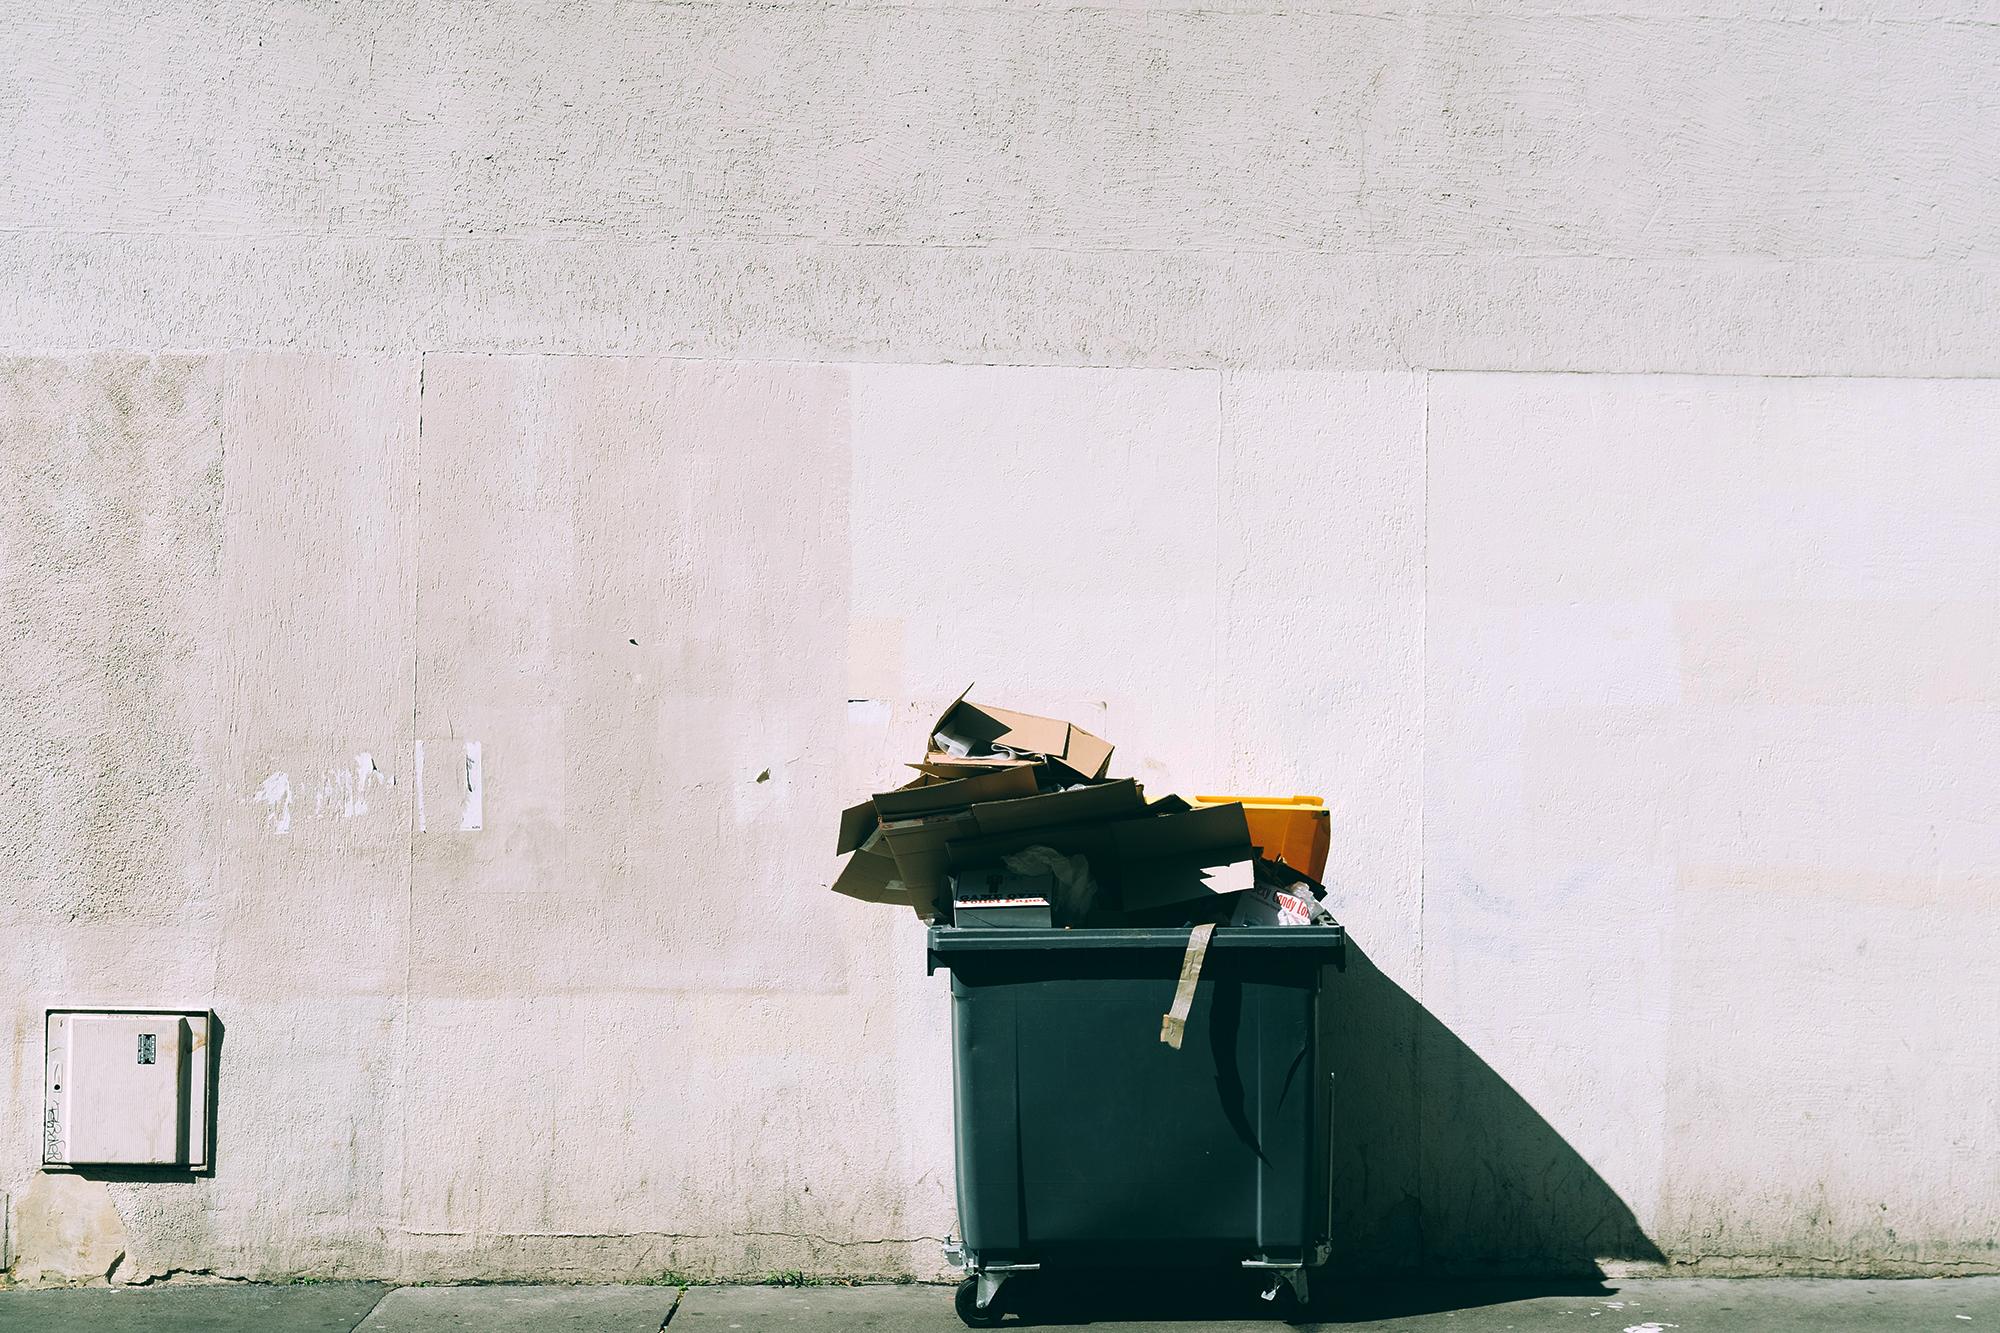 Dumpster bin full of cardboard boxes